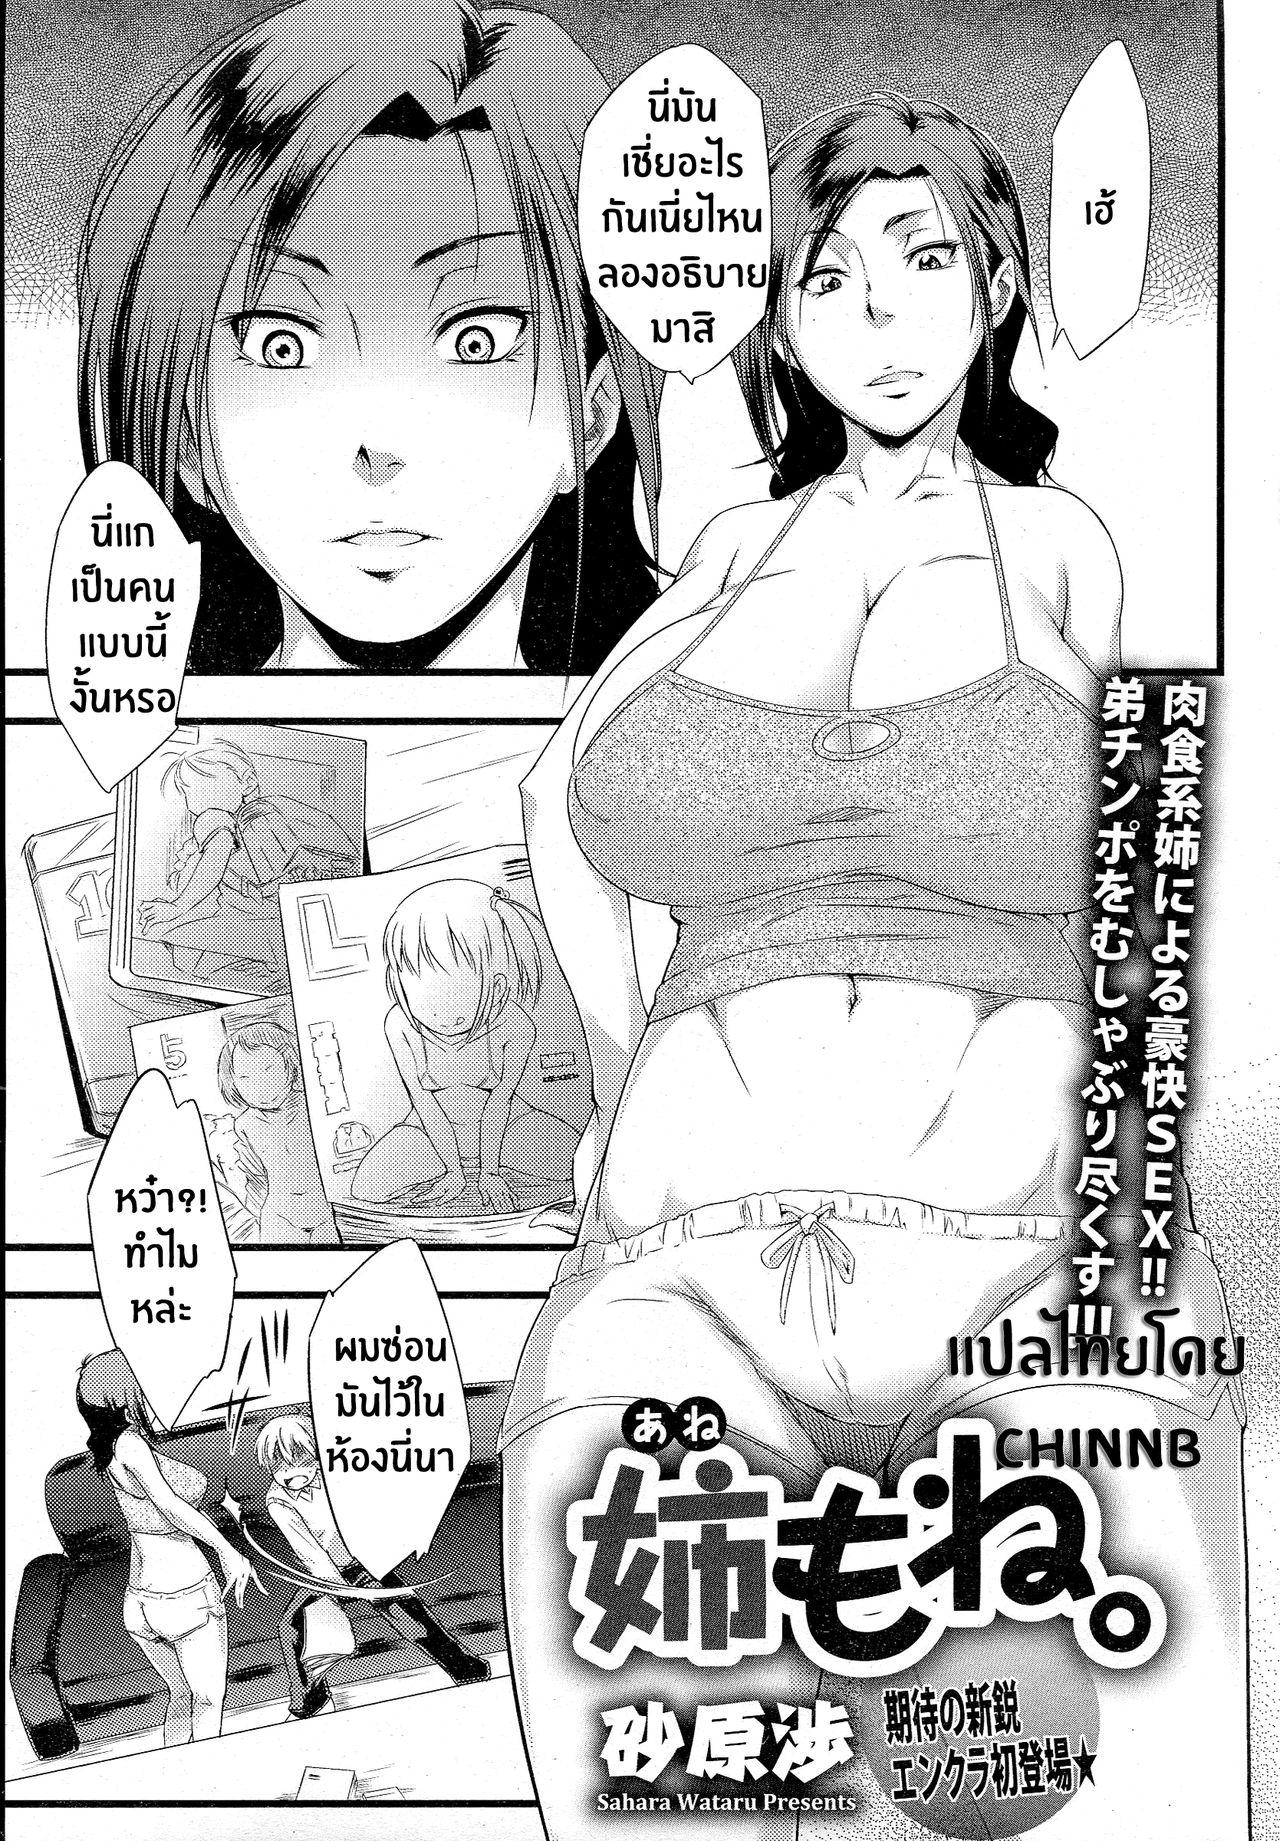 [Sahara Wataru] Anemone   ความรับผิดชอบของพี่สาว (ANGEL Club 2015-07) [Thai ภาษาไทย]